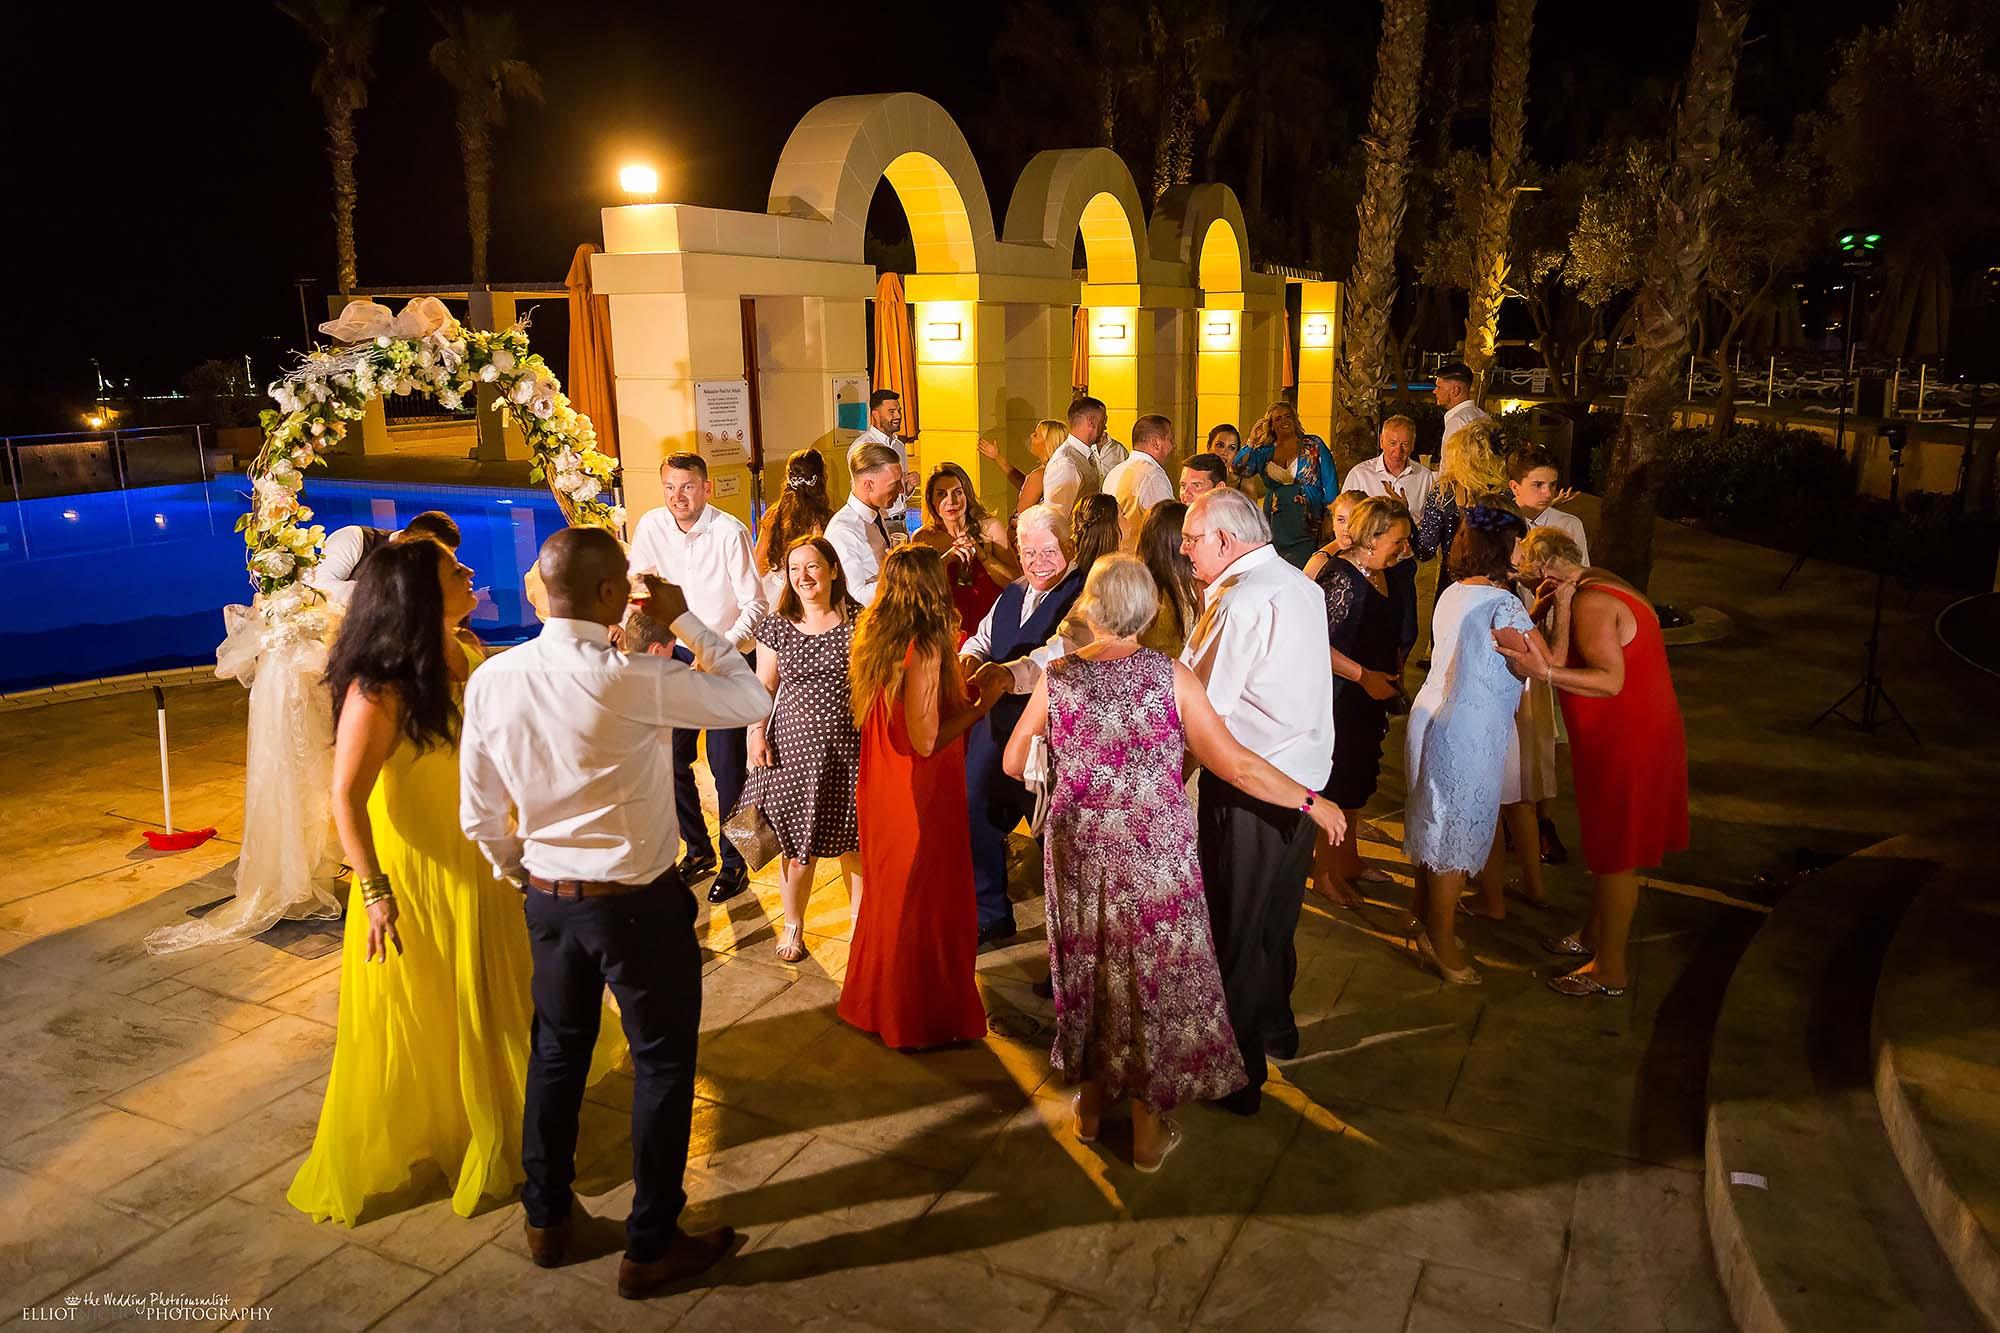 Destination wedding guests on the dance floor.